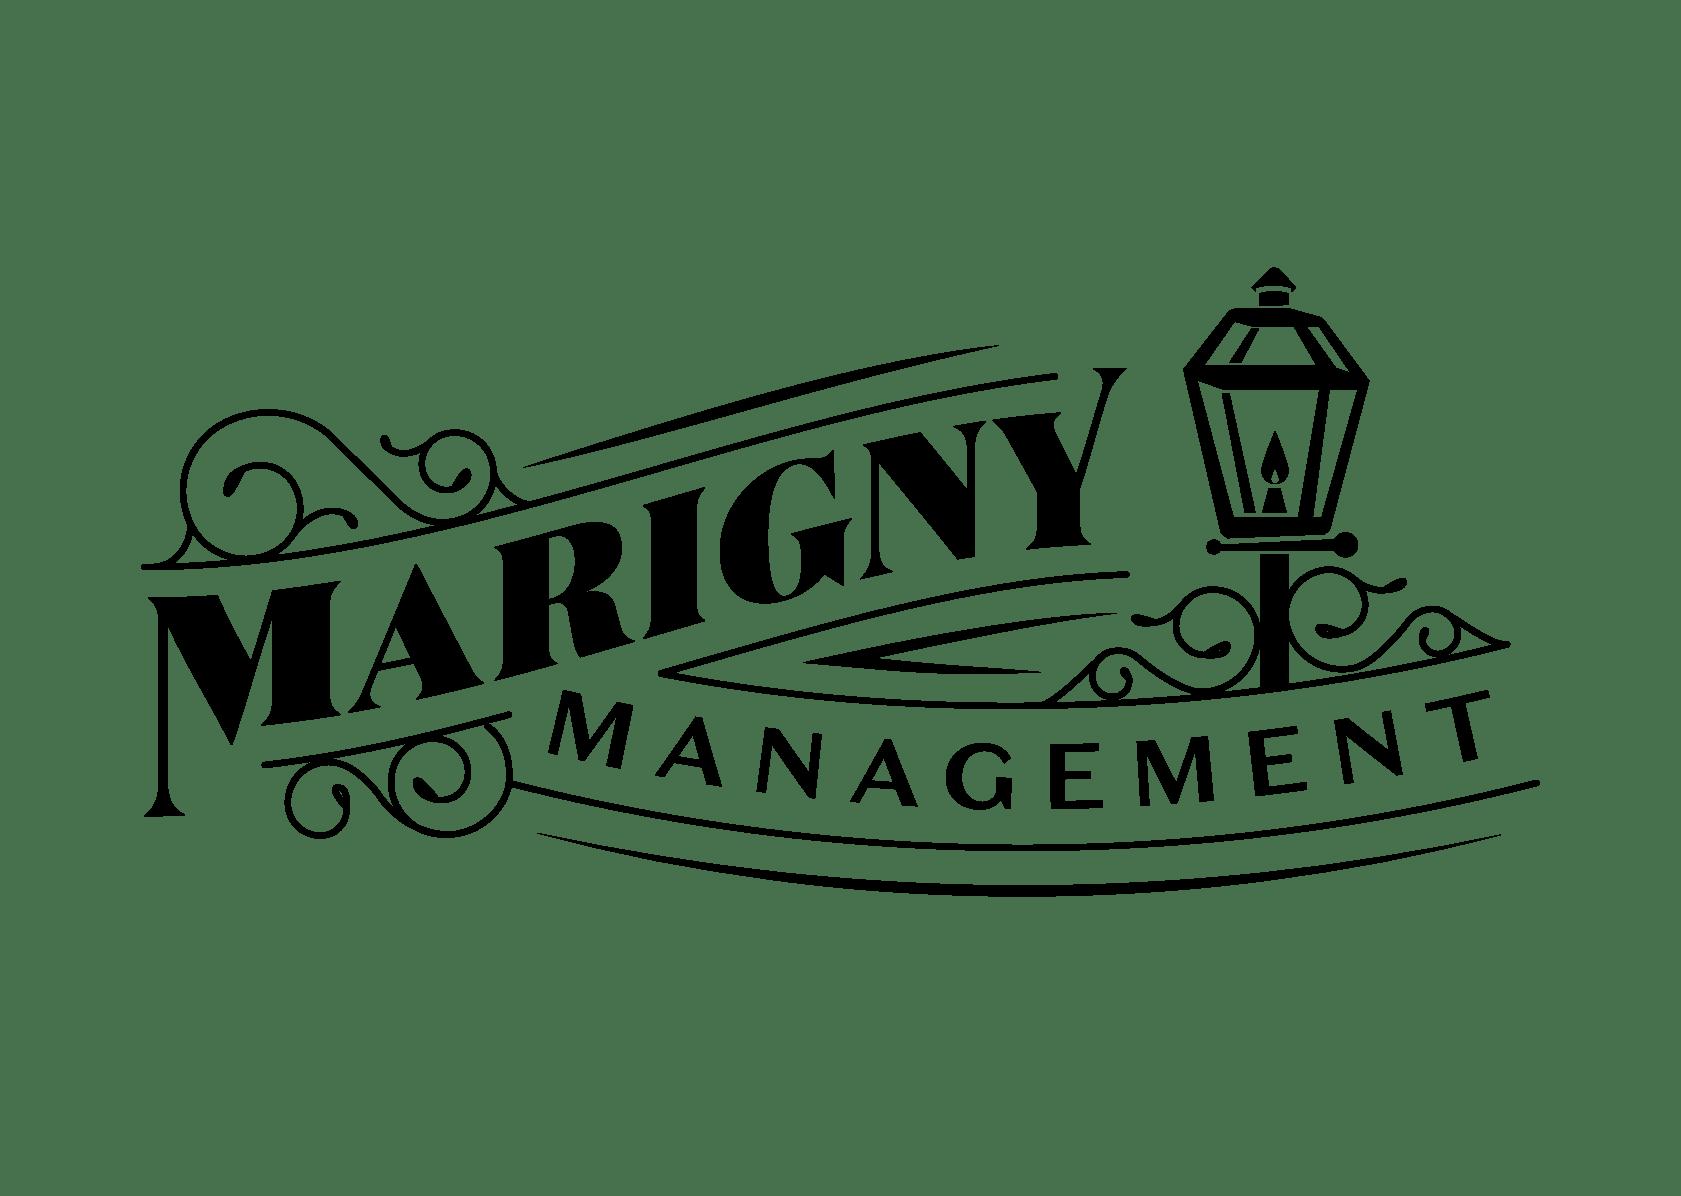 Marigny Management icon